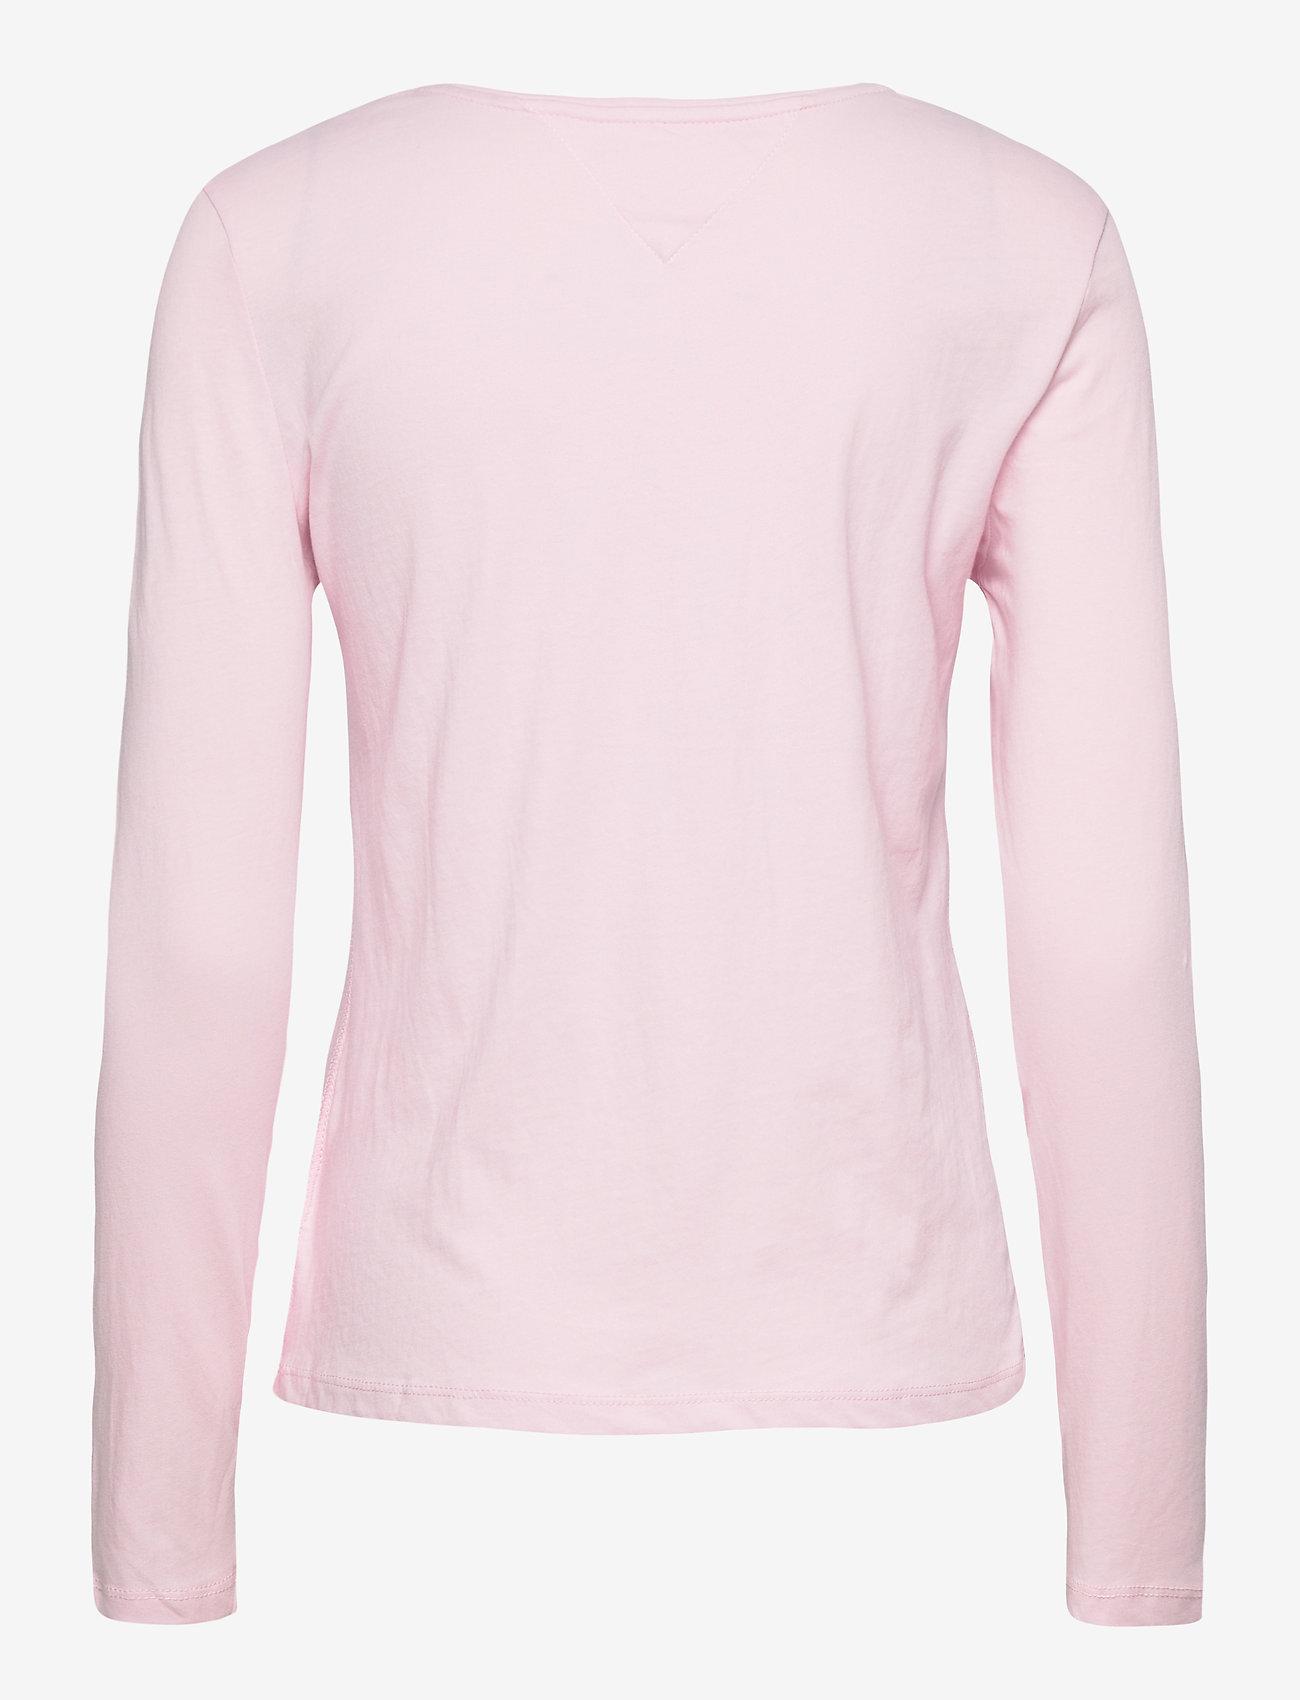 Tommy Jeans - TJW JERSEY V NECK LONGSLEEVE - long-sleeved tops - romantic pink - 1